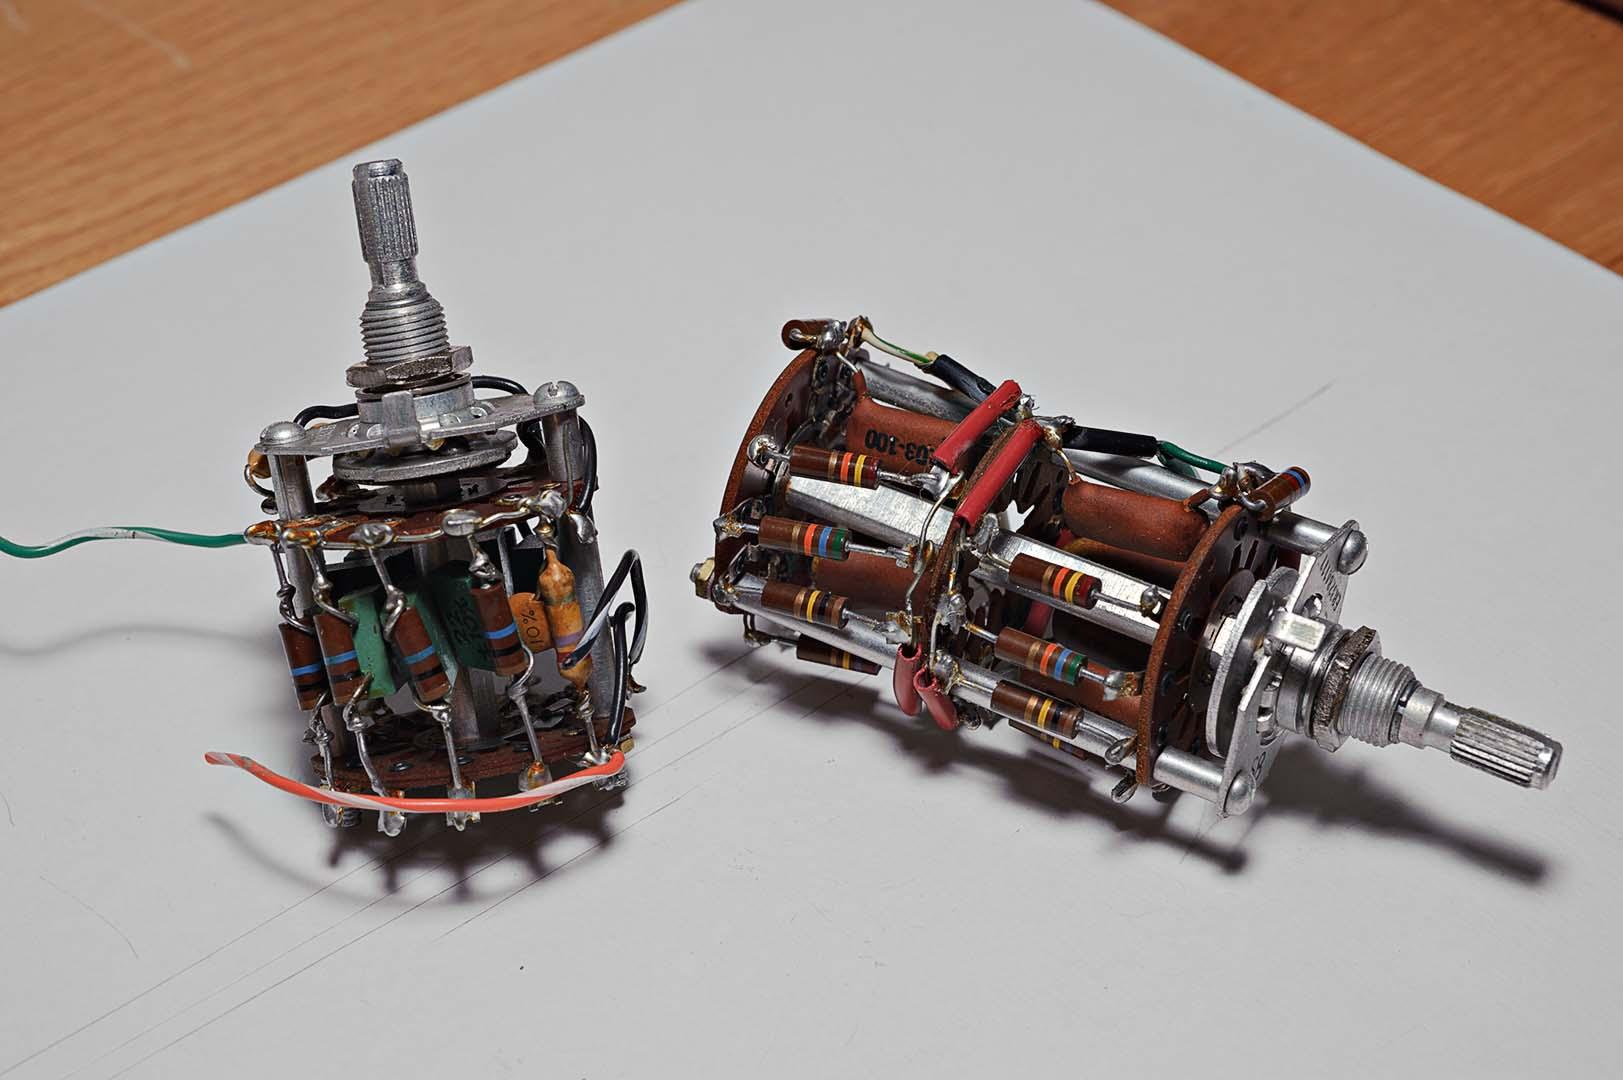 Harman Kardon Citation Tube Audio: Citation I Refurb - Wiring the ...